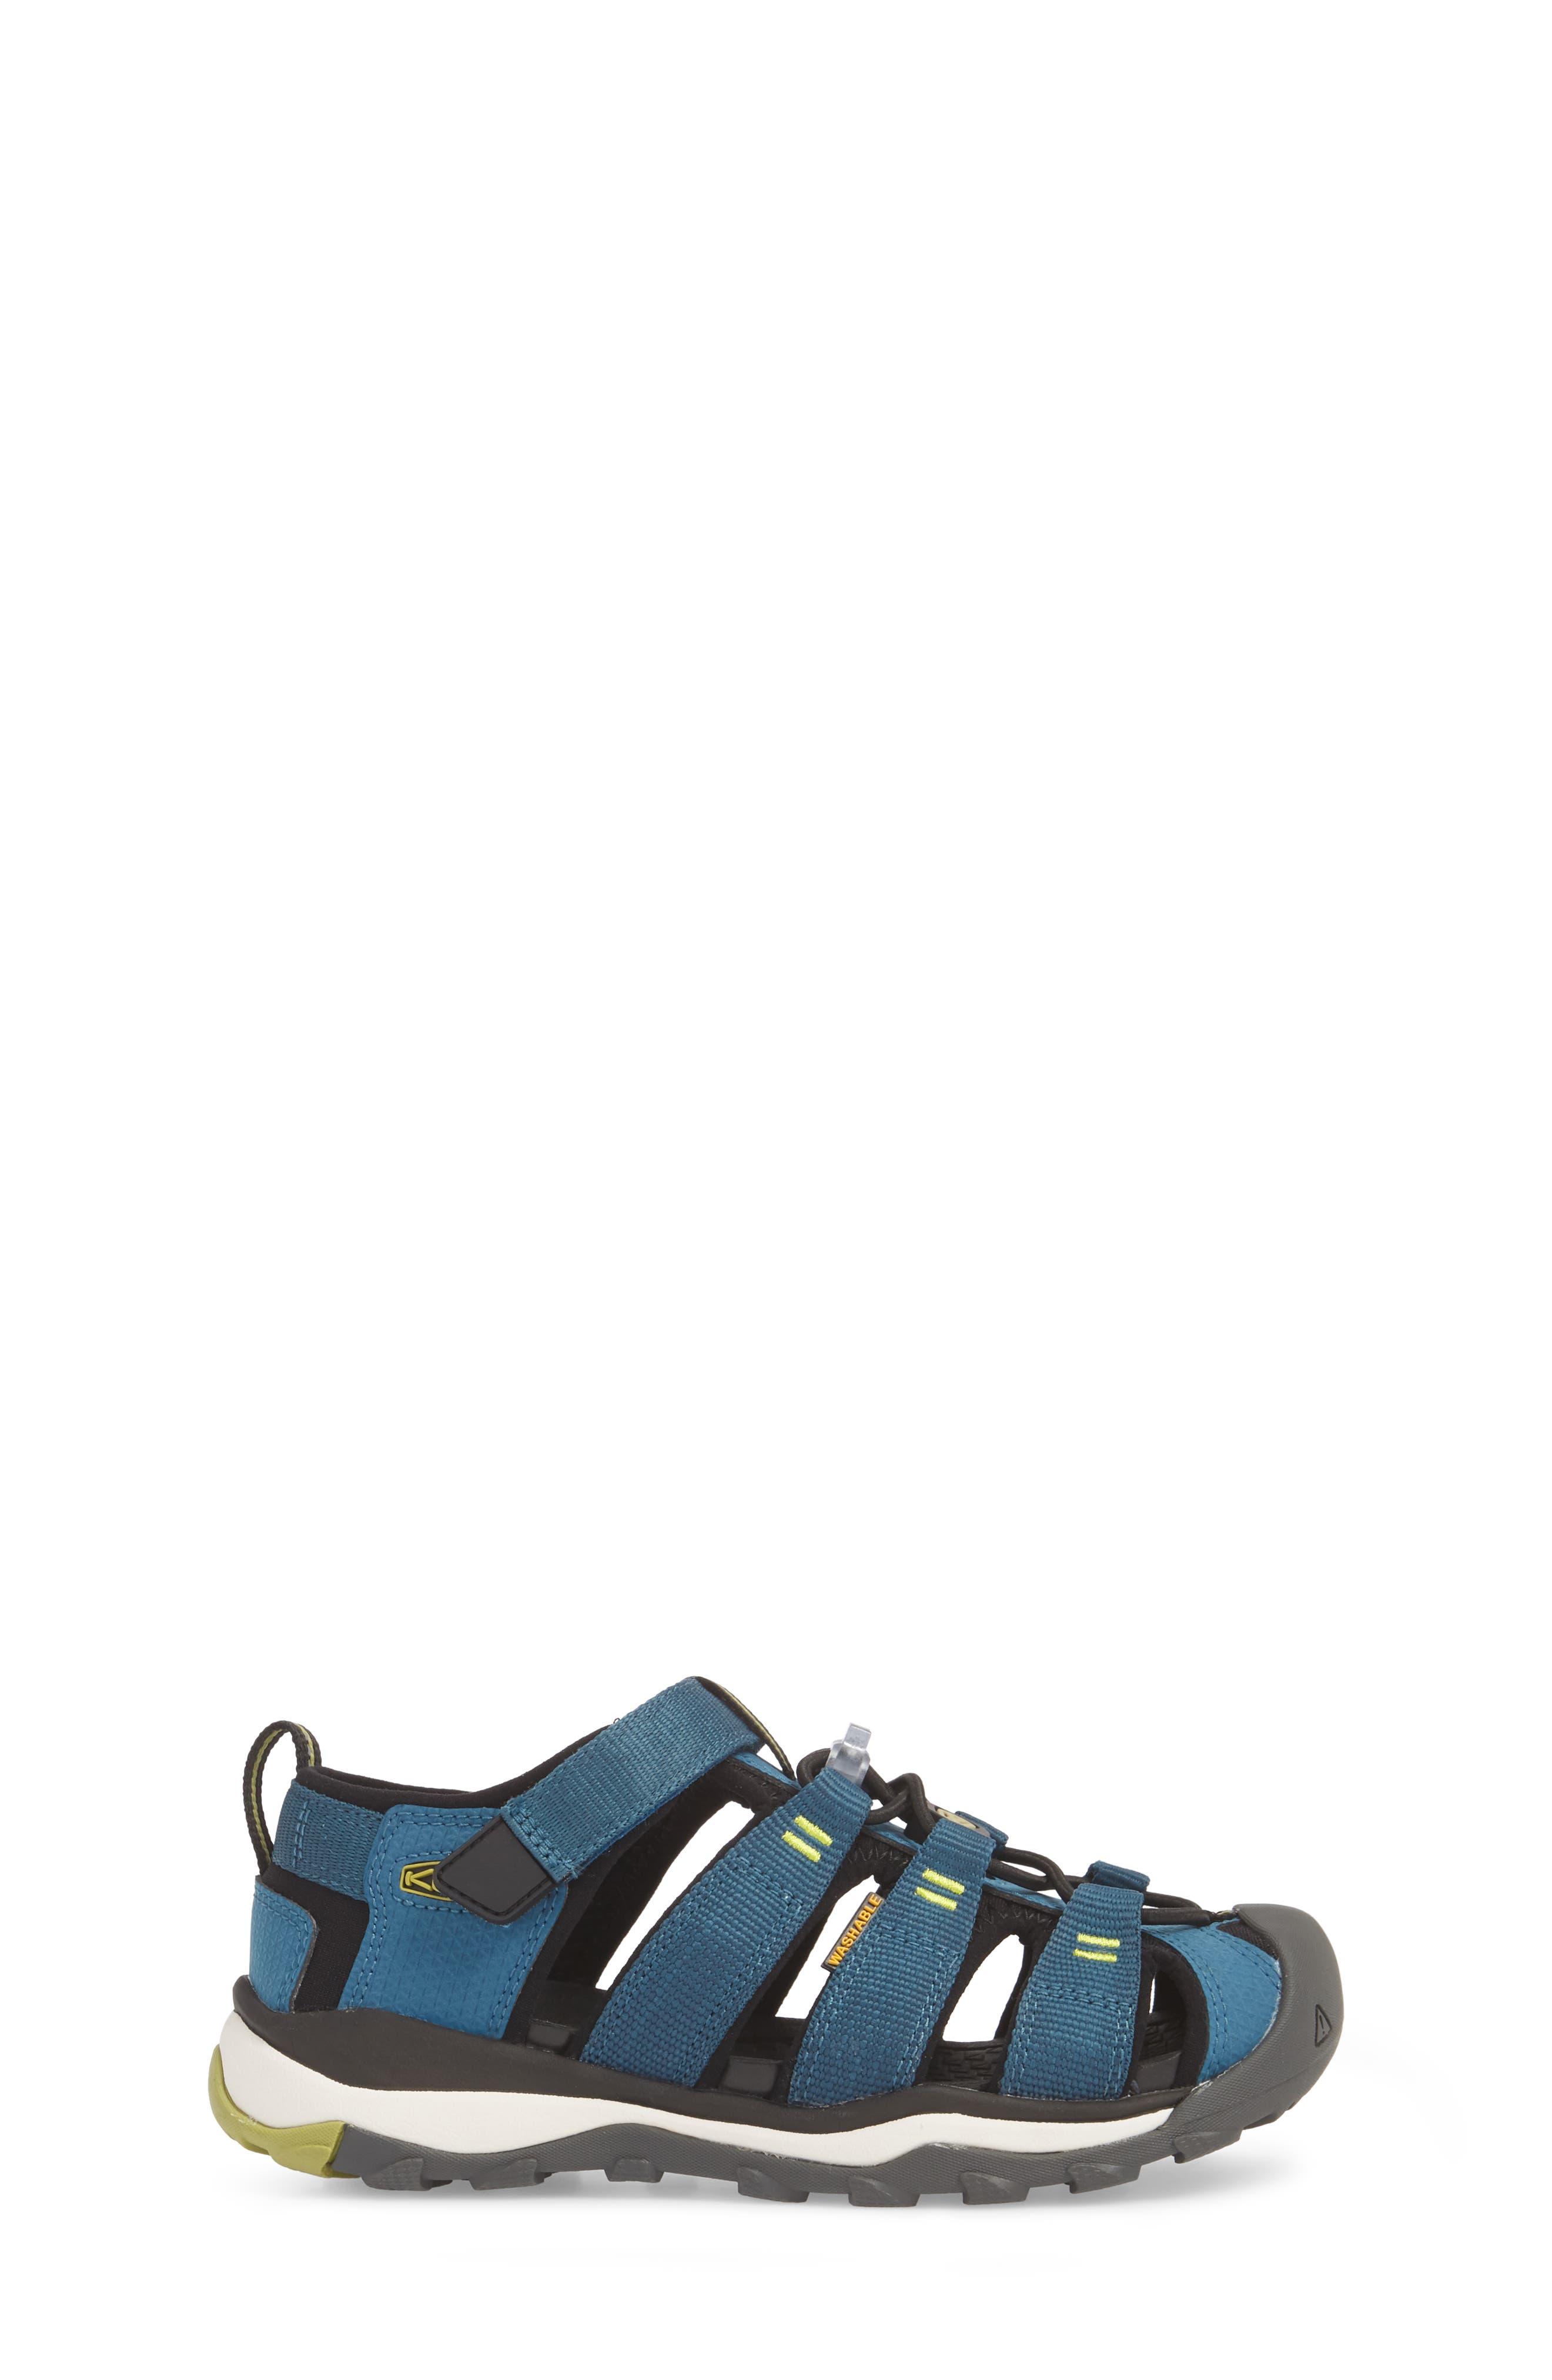 KEEN, Newport Neo H2 Water Friendly Sandal, Alternate thumbnail 3, color, LEGION BLUE/ MOSS